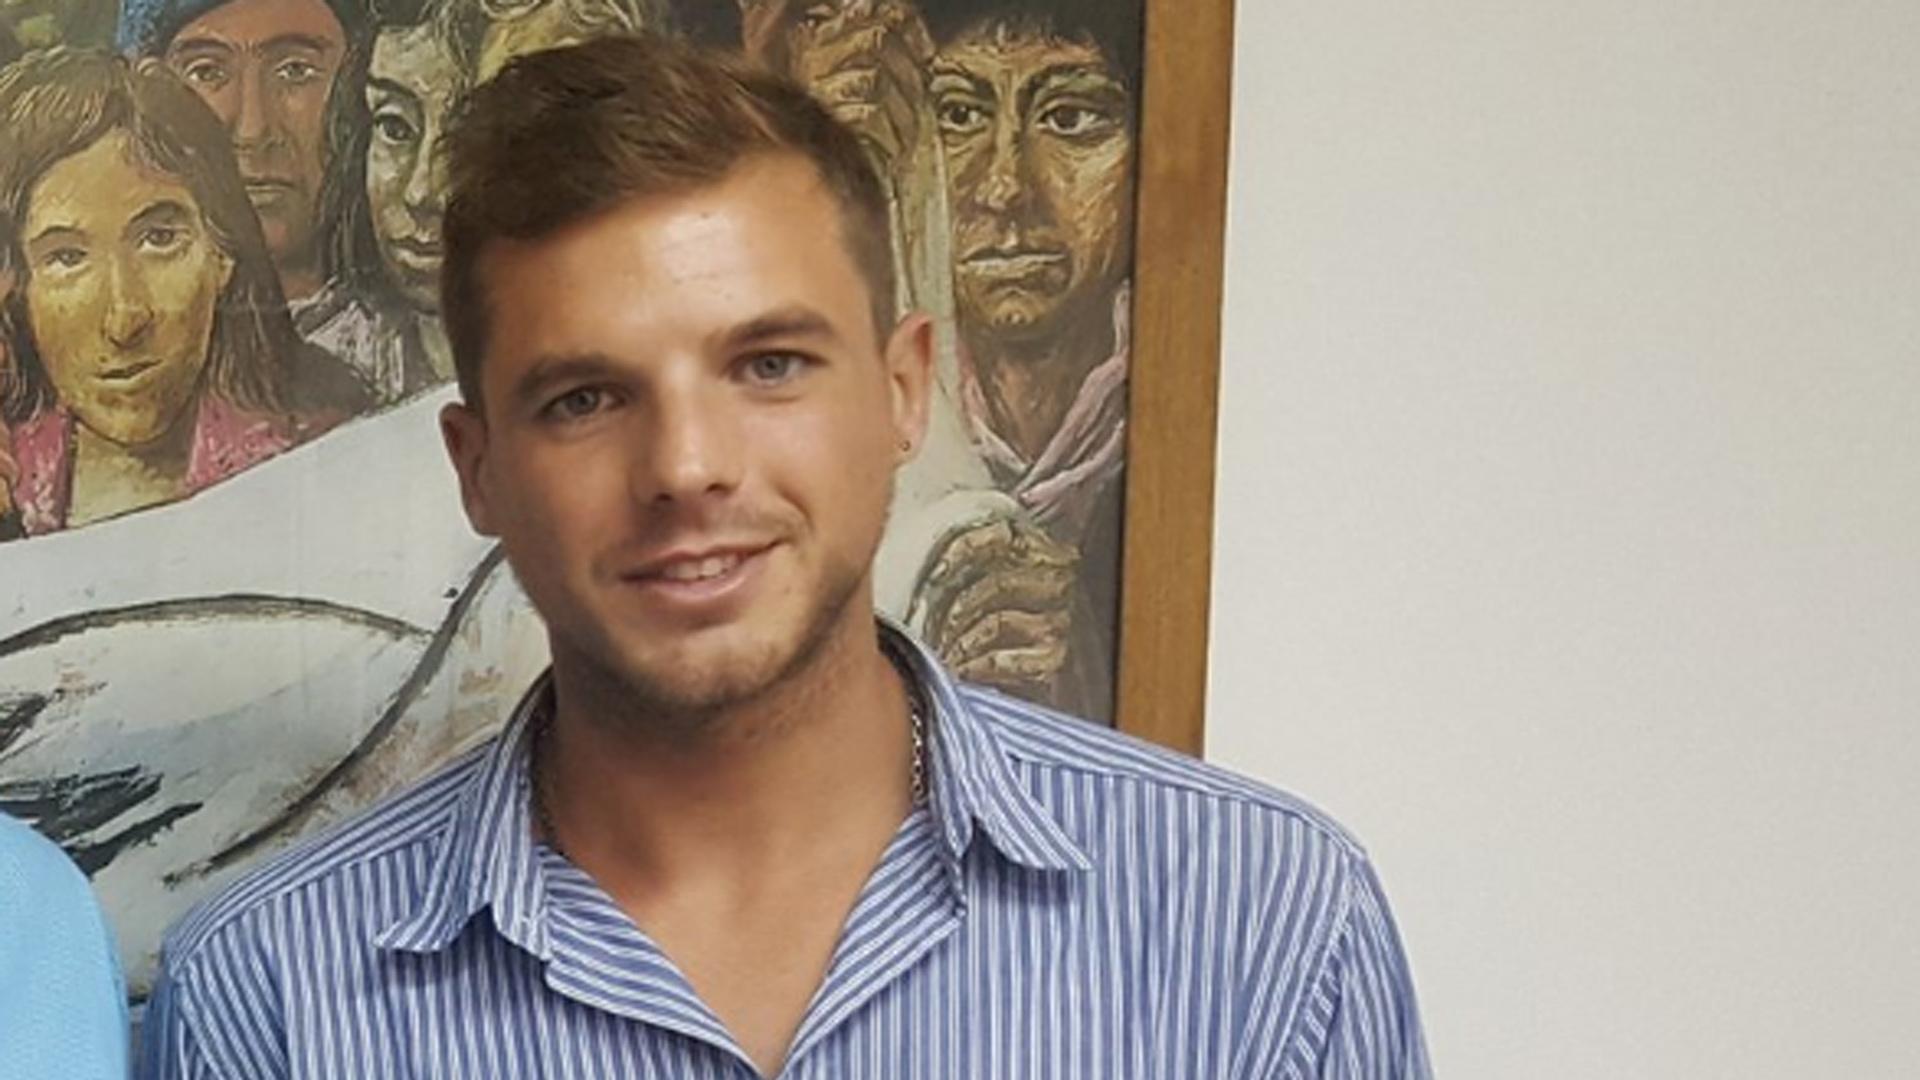 Cristian Sartor (Twitter)